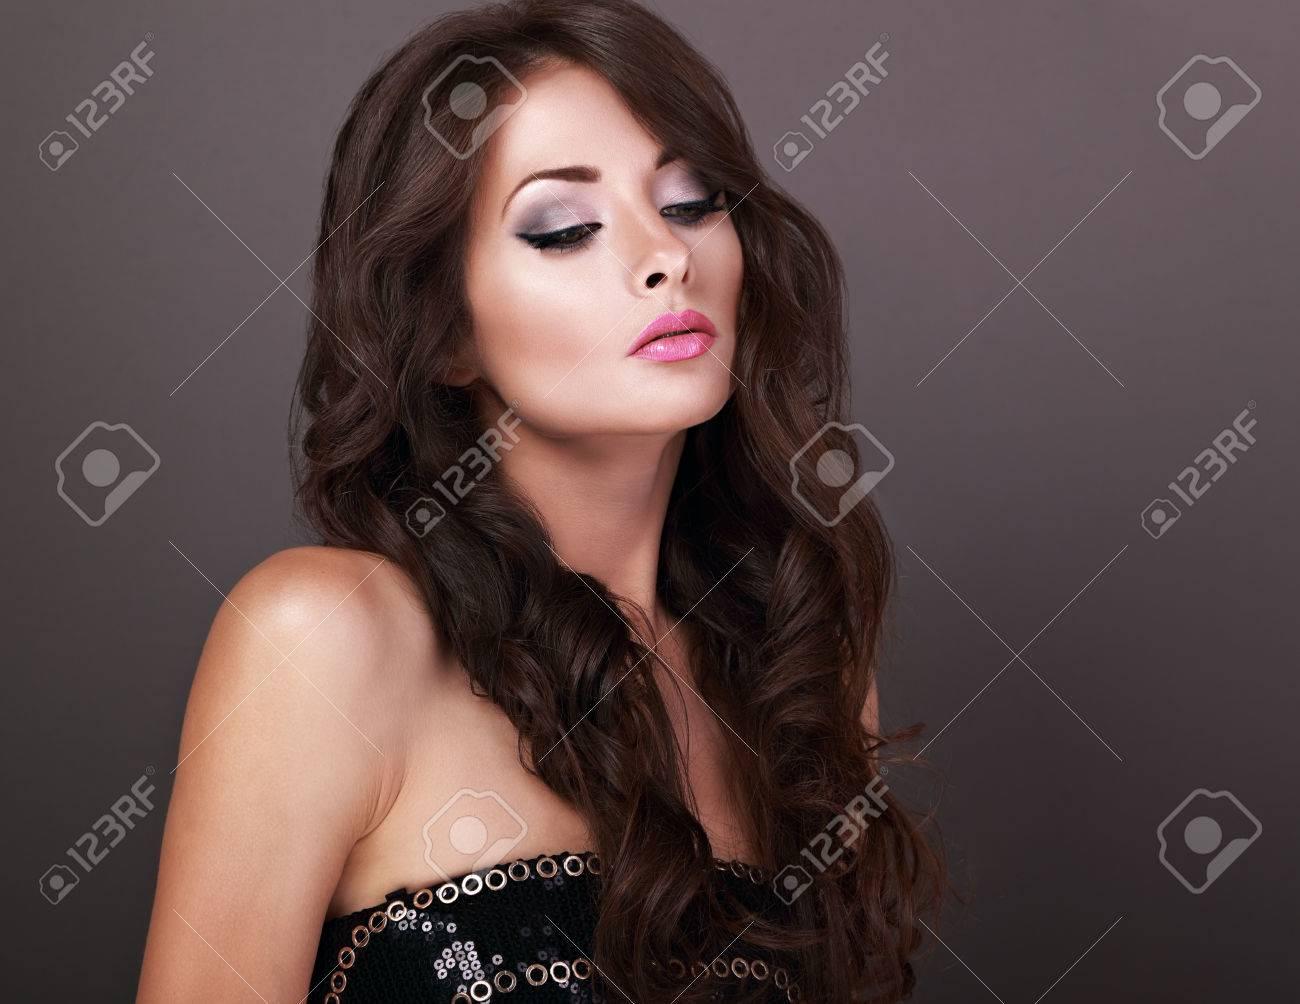 foto de archivo elegante hermosa hembra maquillaje modelo posando con corte de pelo largo y rizado volumen sobre fondo gris